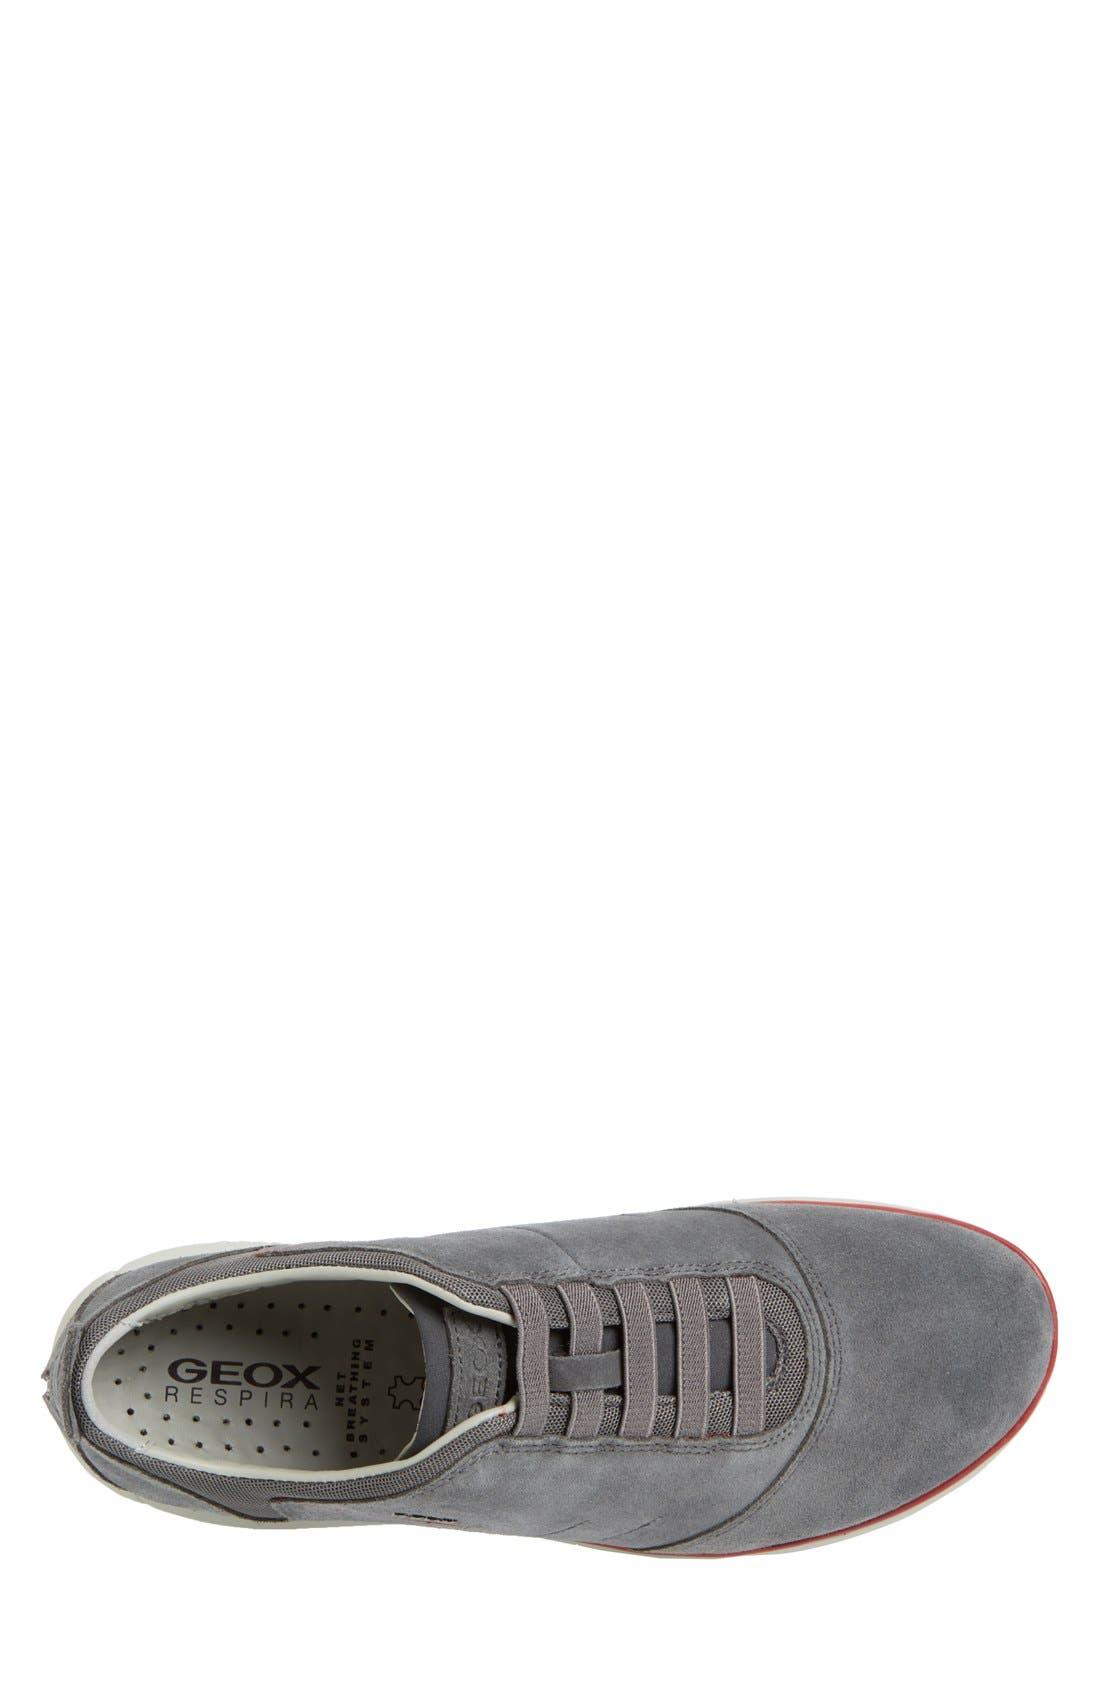 Alternate Image 3  - Geox 'Nebula 7' Slip-On Sneaker (Men)